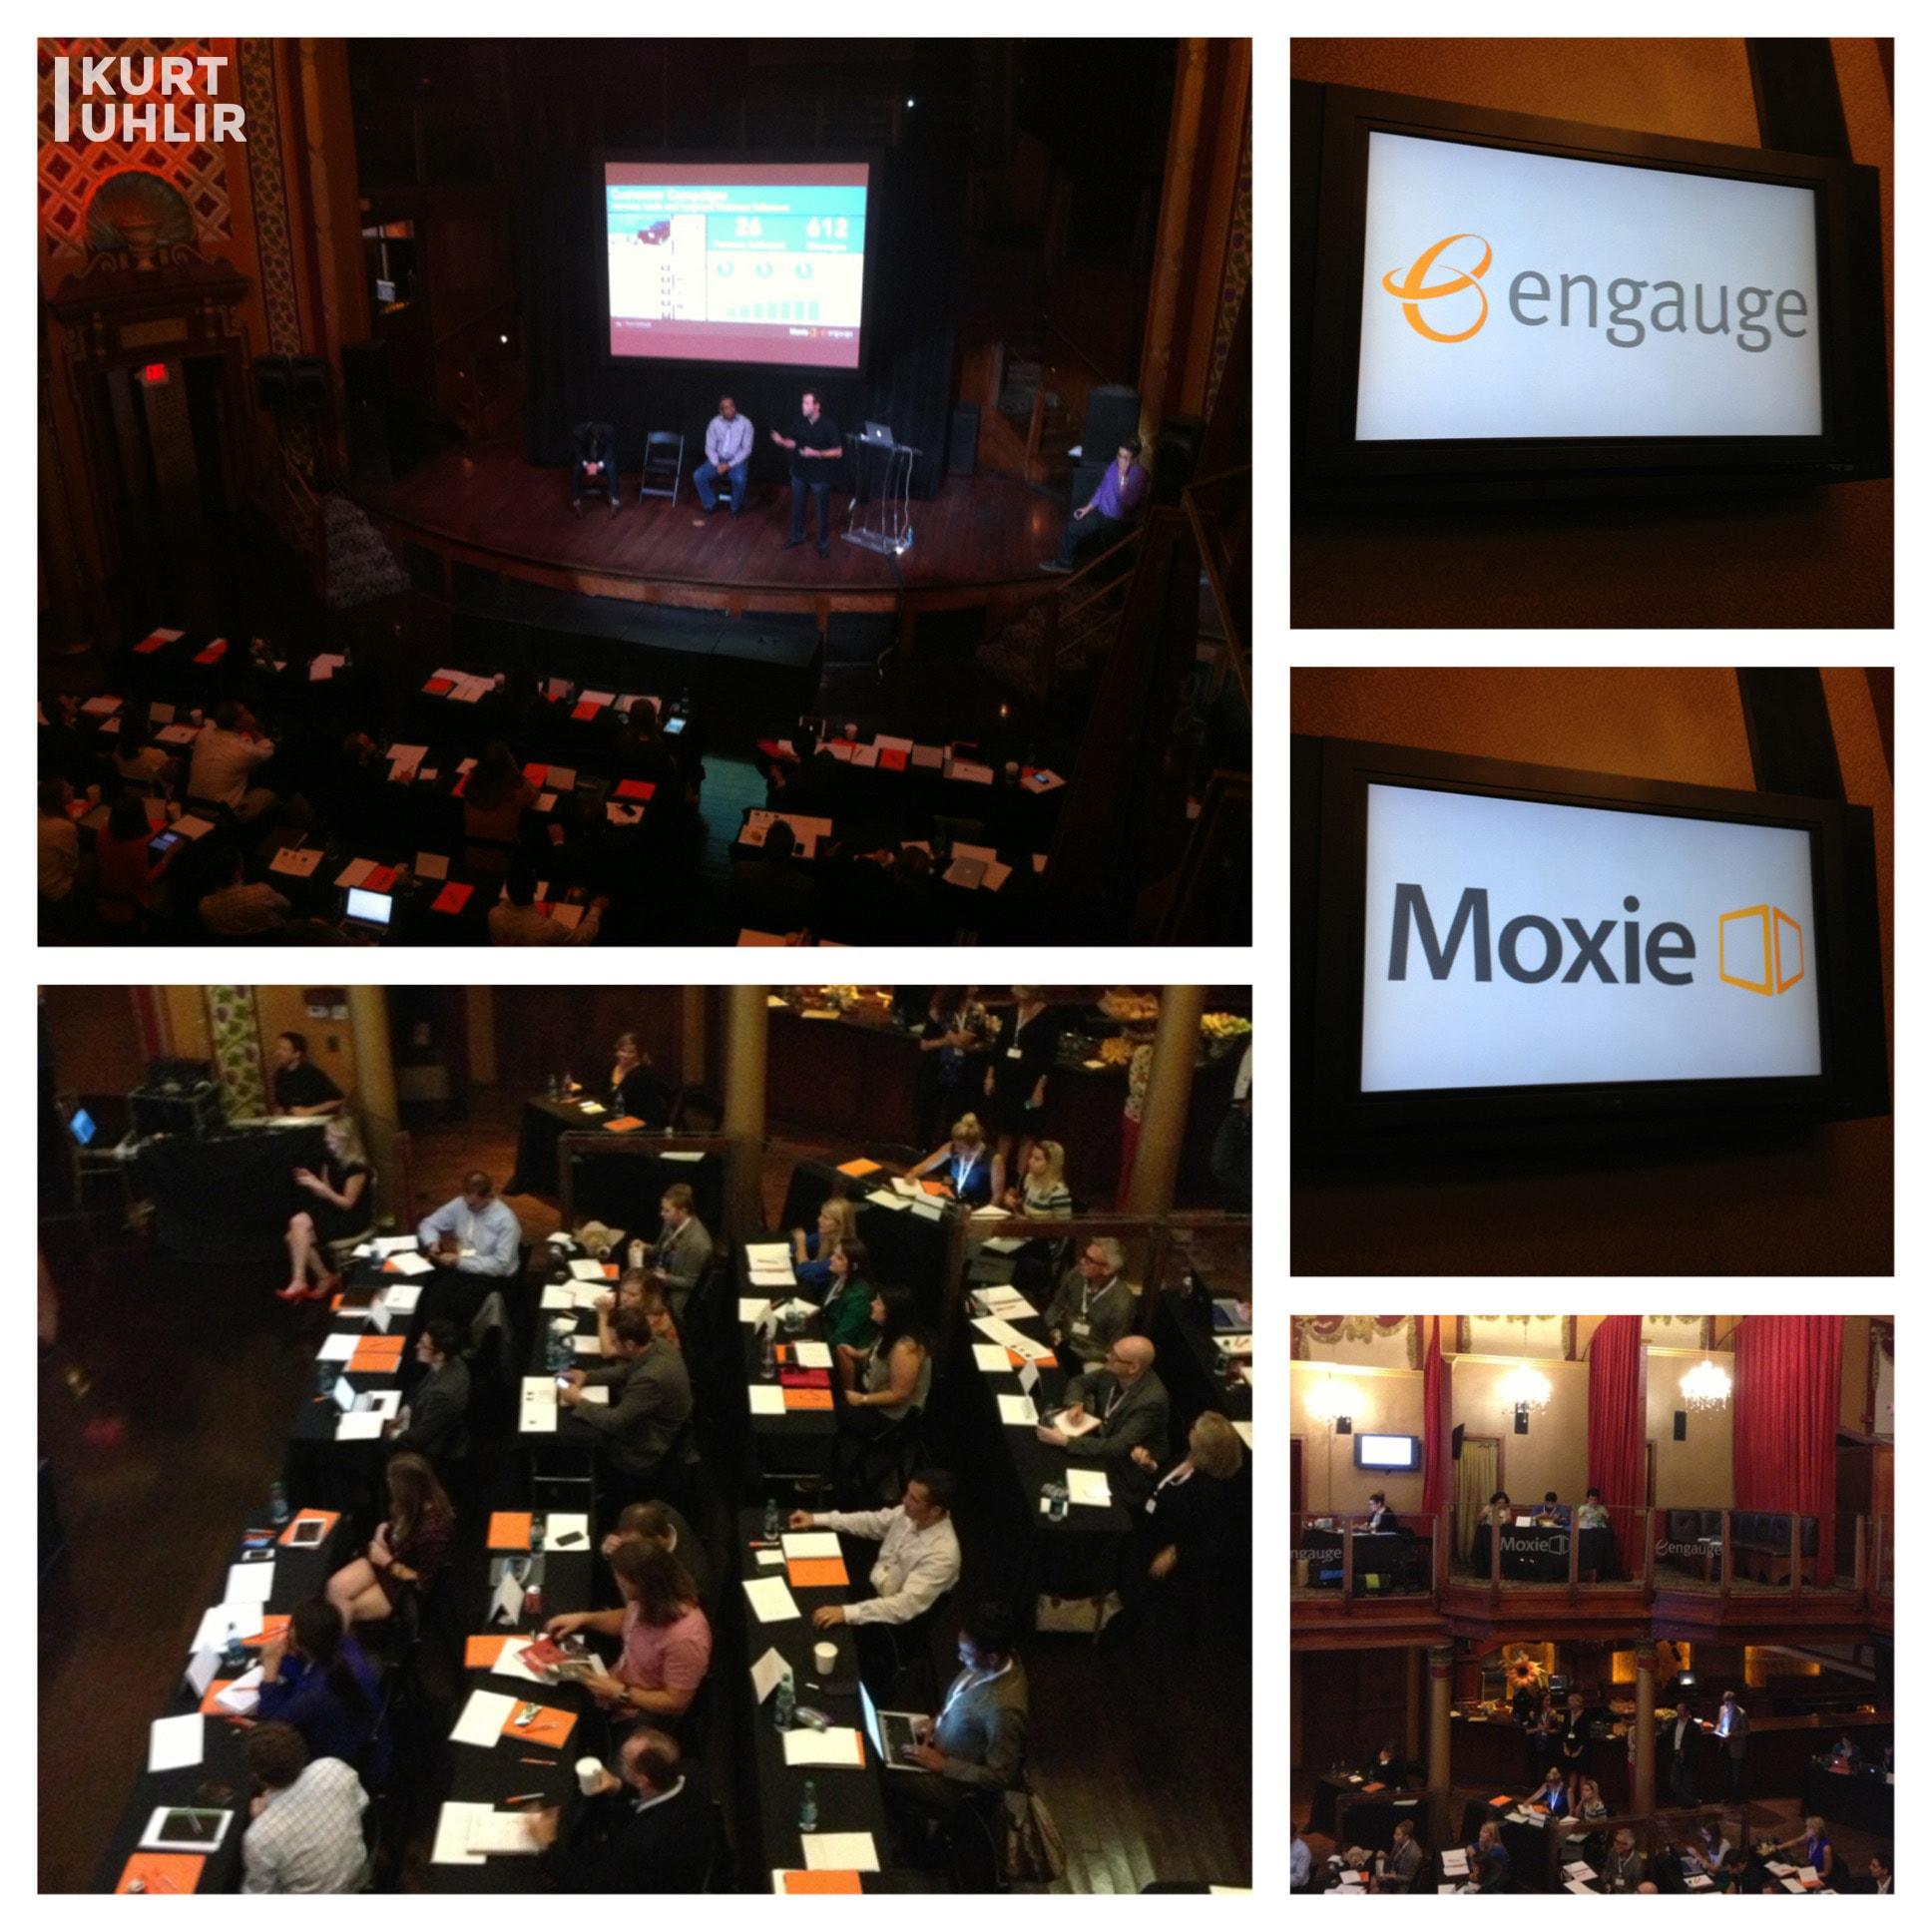 Kurt Uhlir presenting at Moxie Engauge DIG Day 2013 on Influencer Marketing